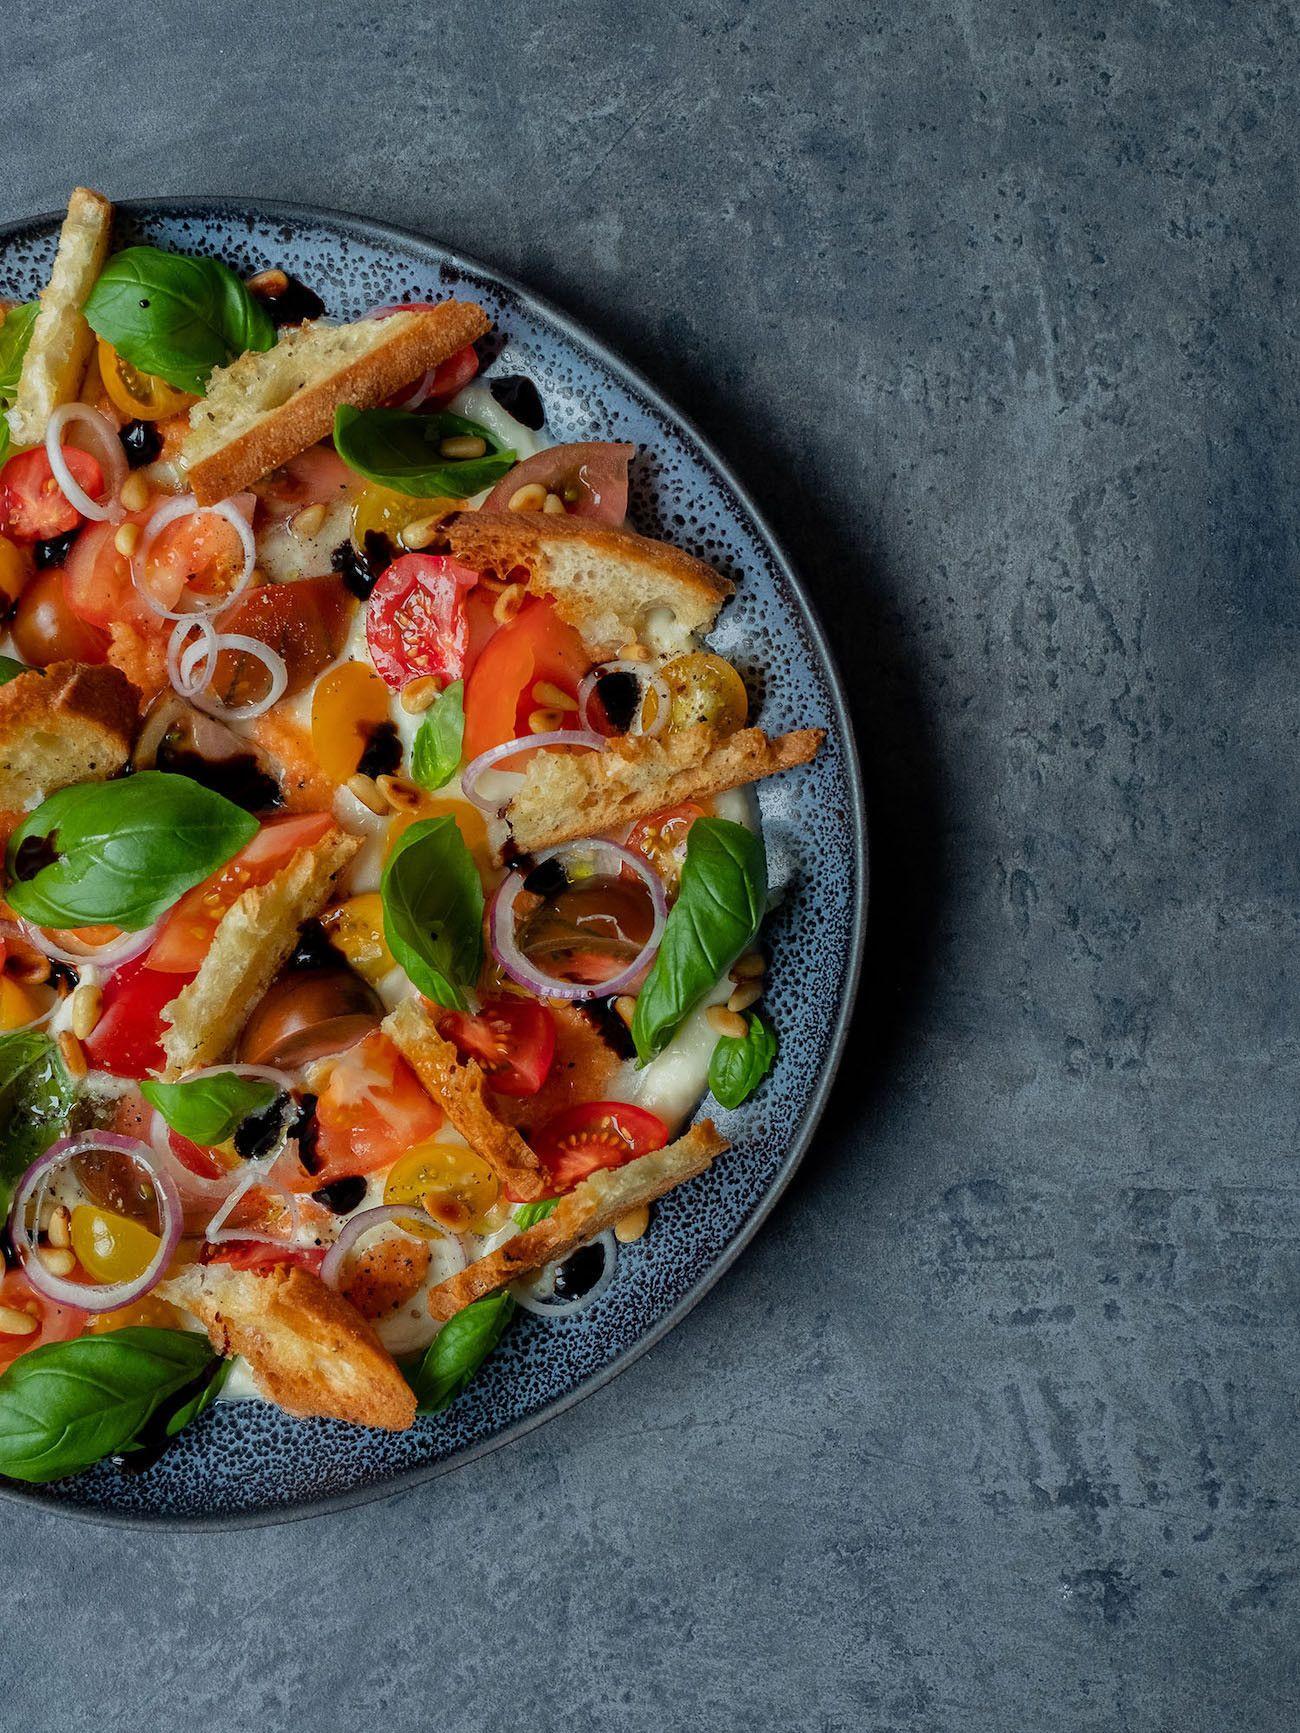 Foodblog, About Fuel, Rezept, Caprese Salat, Tomaten, Mozzarella, Basilikum, Olivenöl